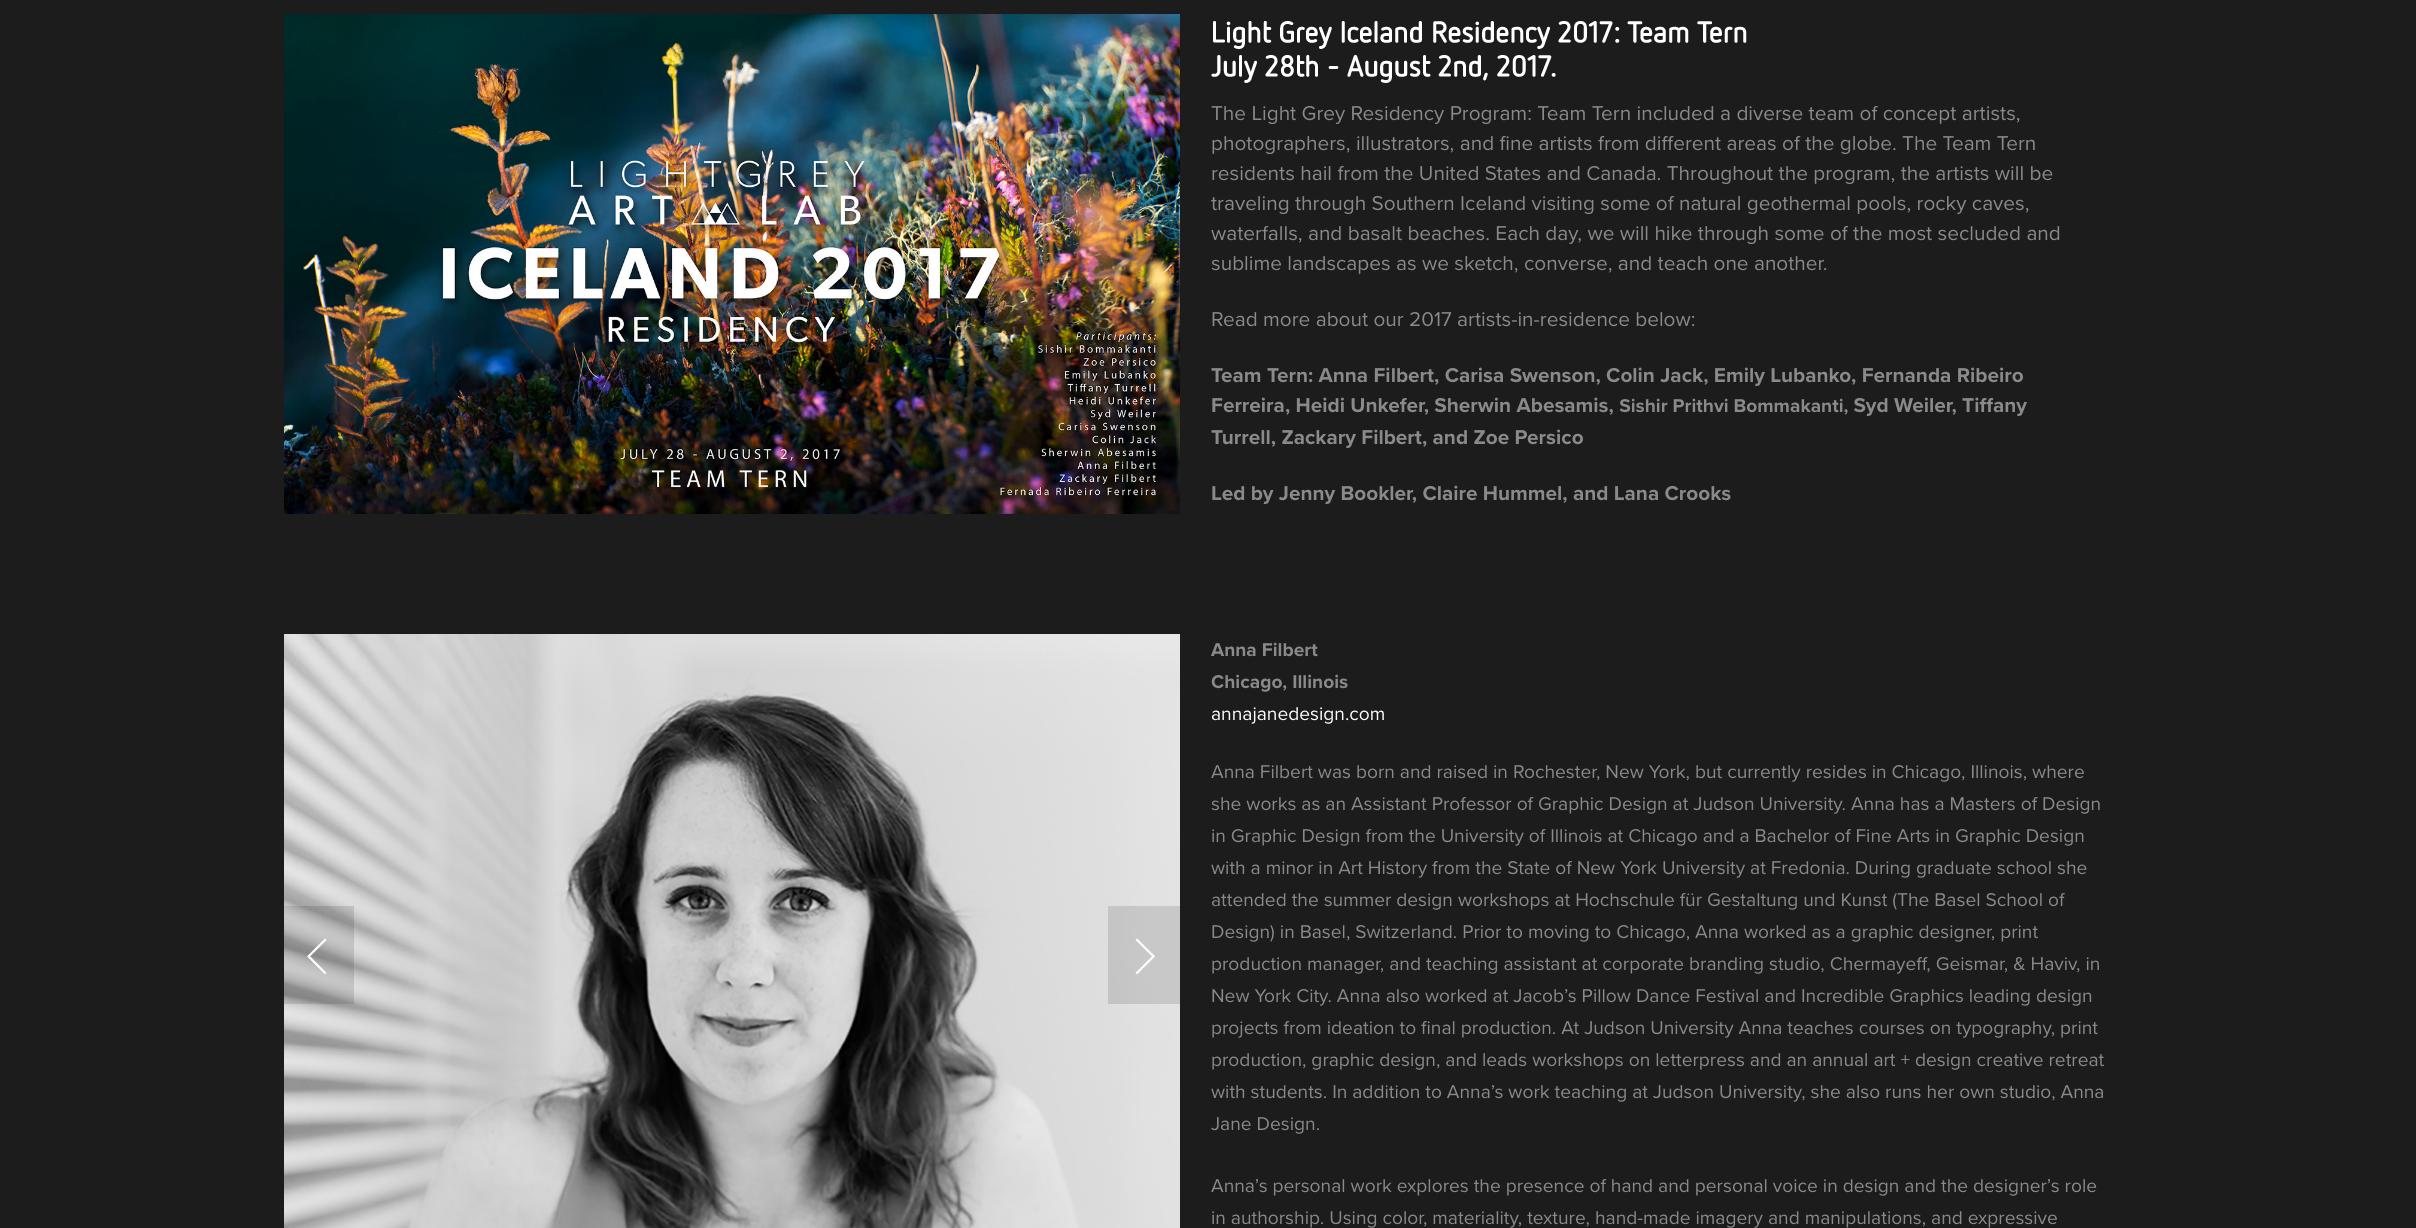 2017 Light Grey Art Lab Iceland Artist-in-Residency, Anna Filbert